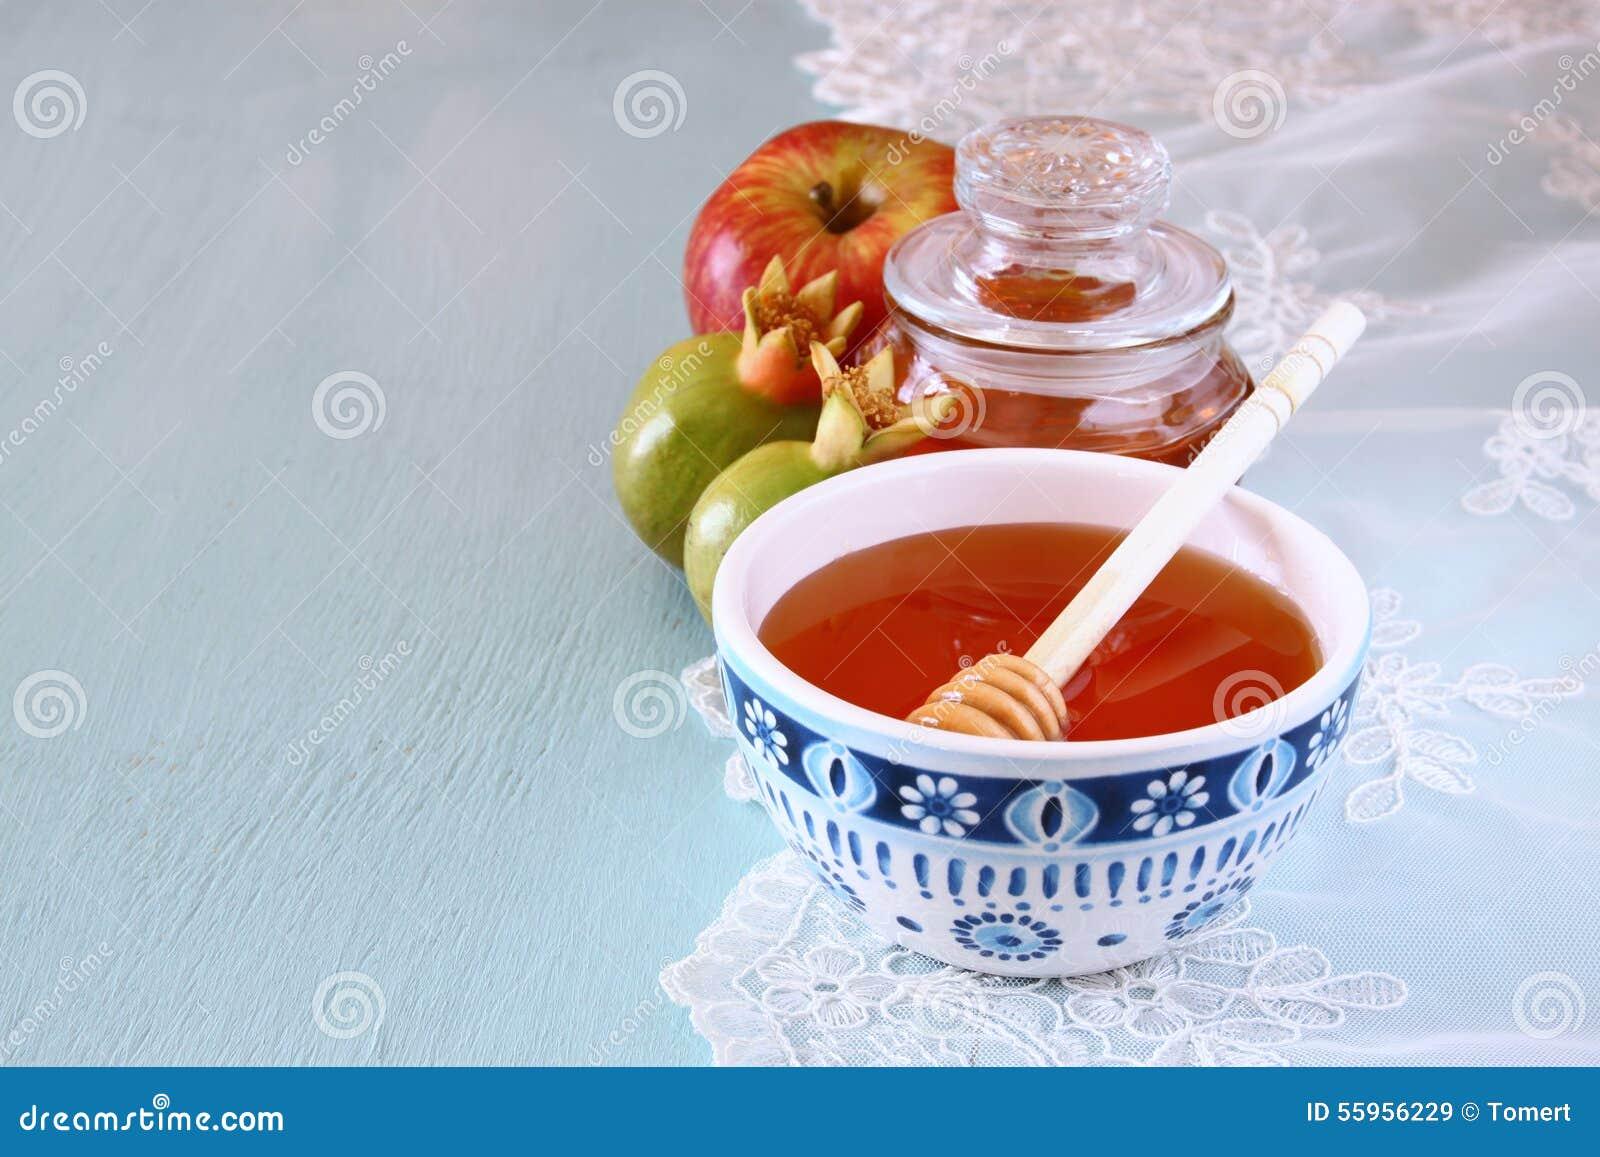 Rosh hashanah jewesh holiday concept honey apple and royalty free stock photo download rosh hashanah biocorpaavc